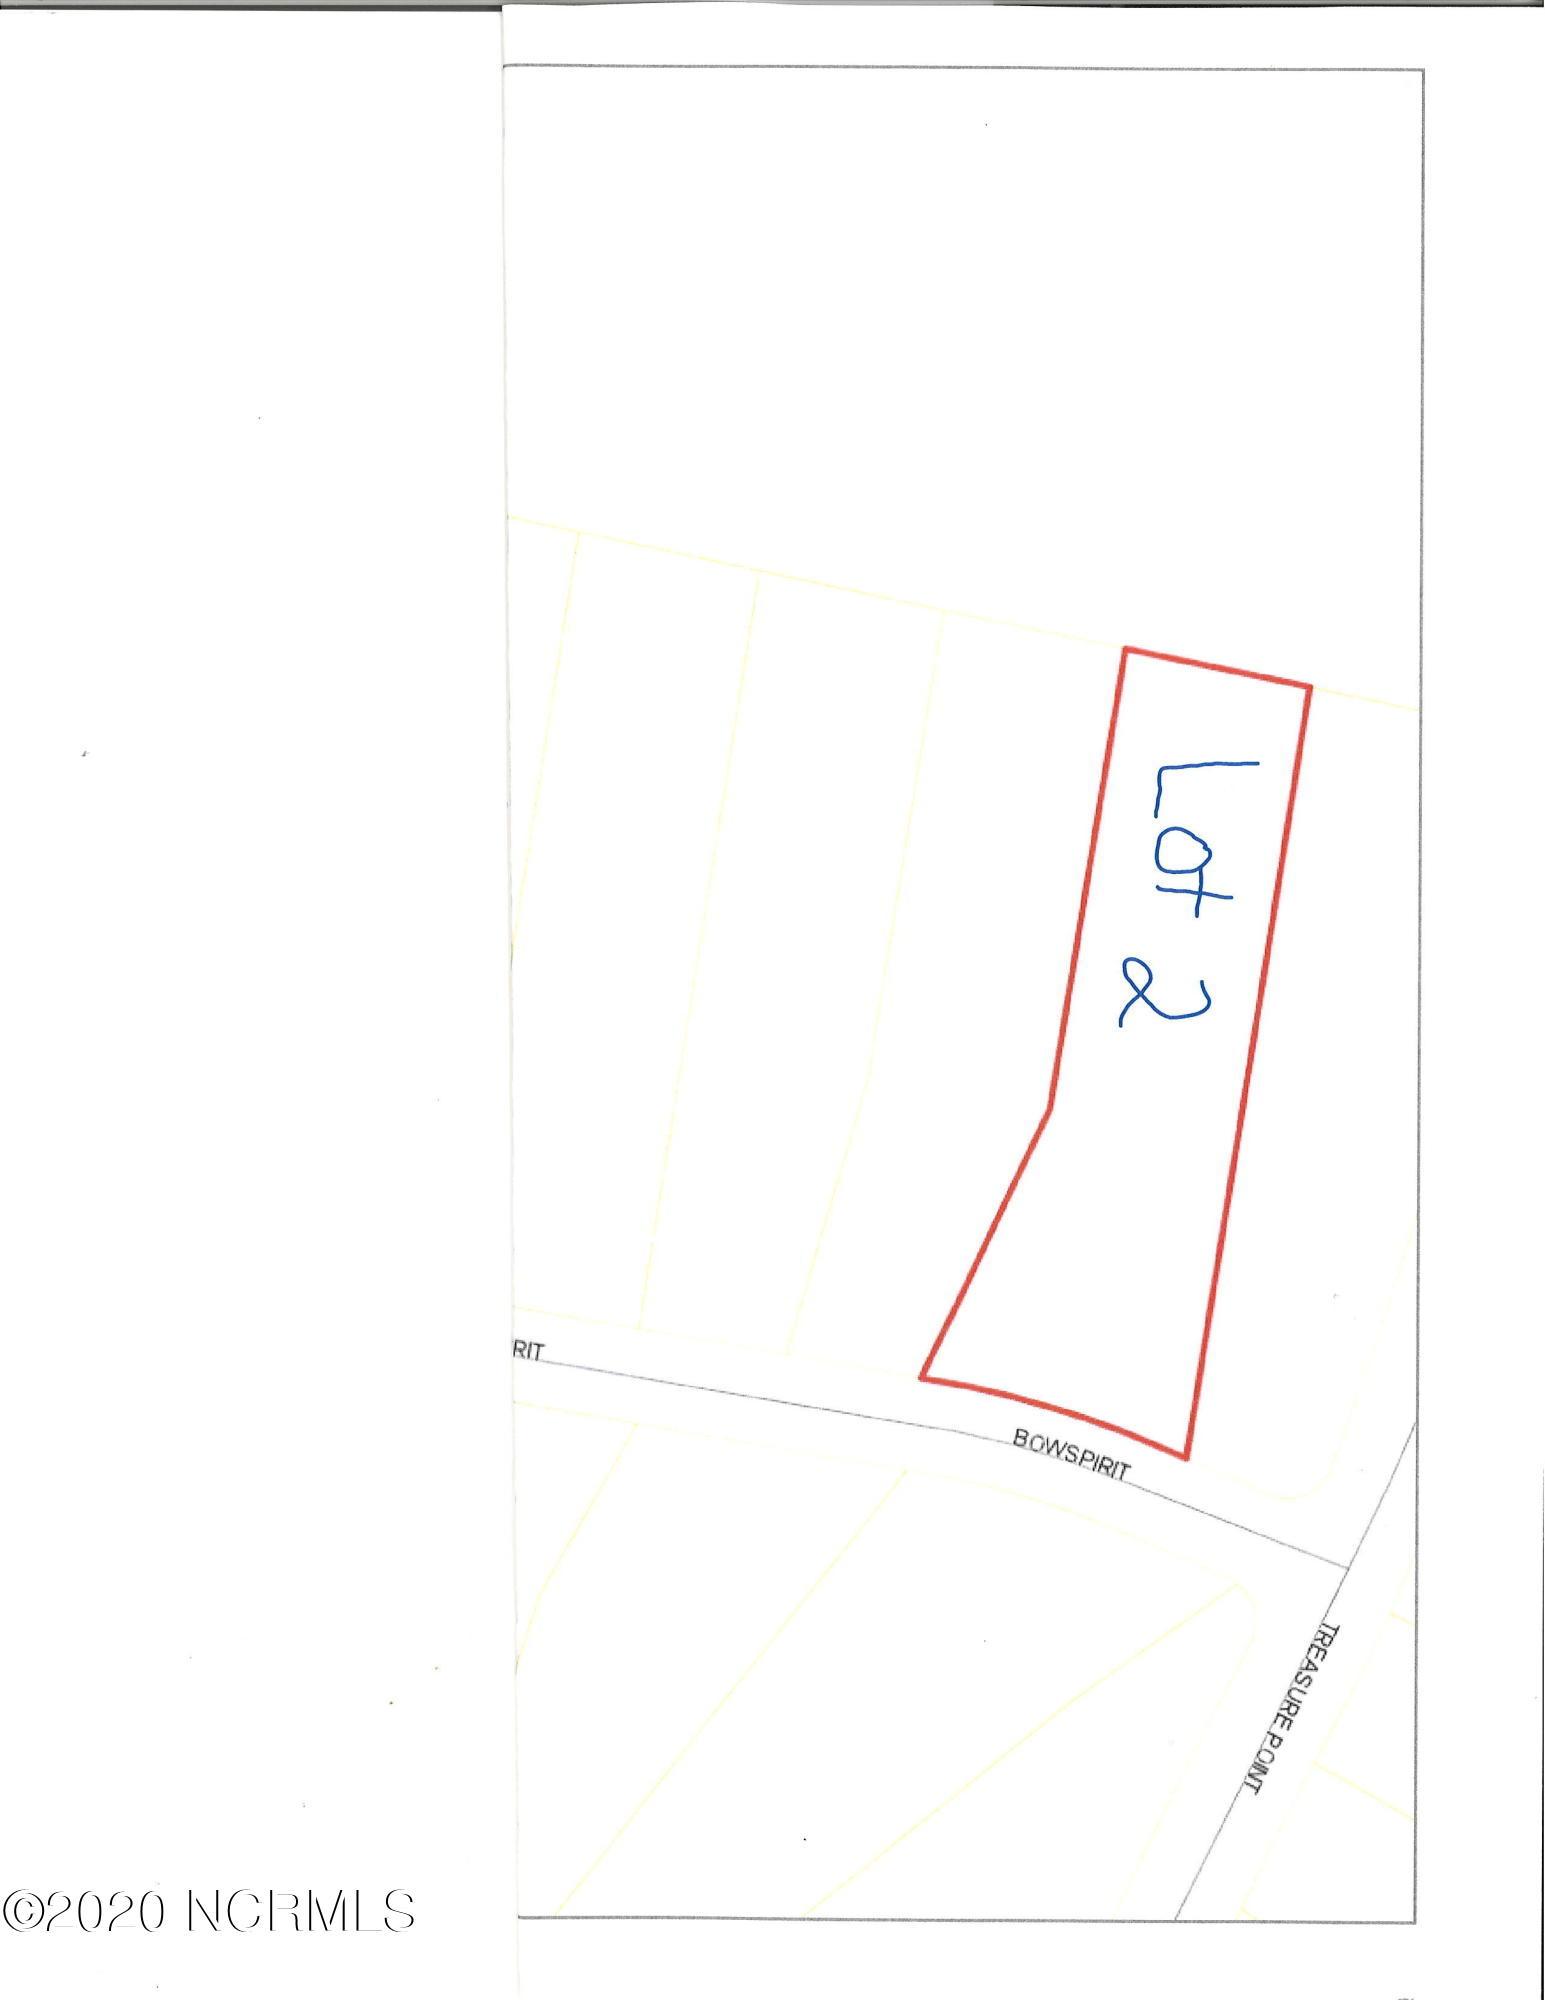 Lot 2 Bowspirit Place, Bath, North Carolina 27808, ,Residential land,For sale,Bowspirit,100249323